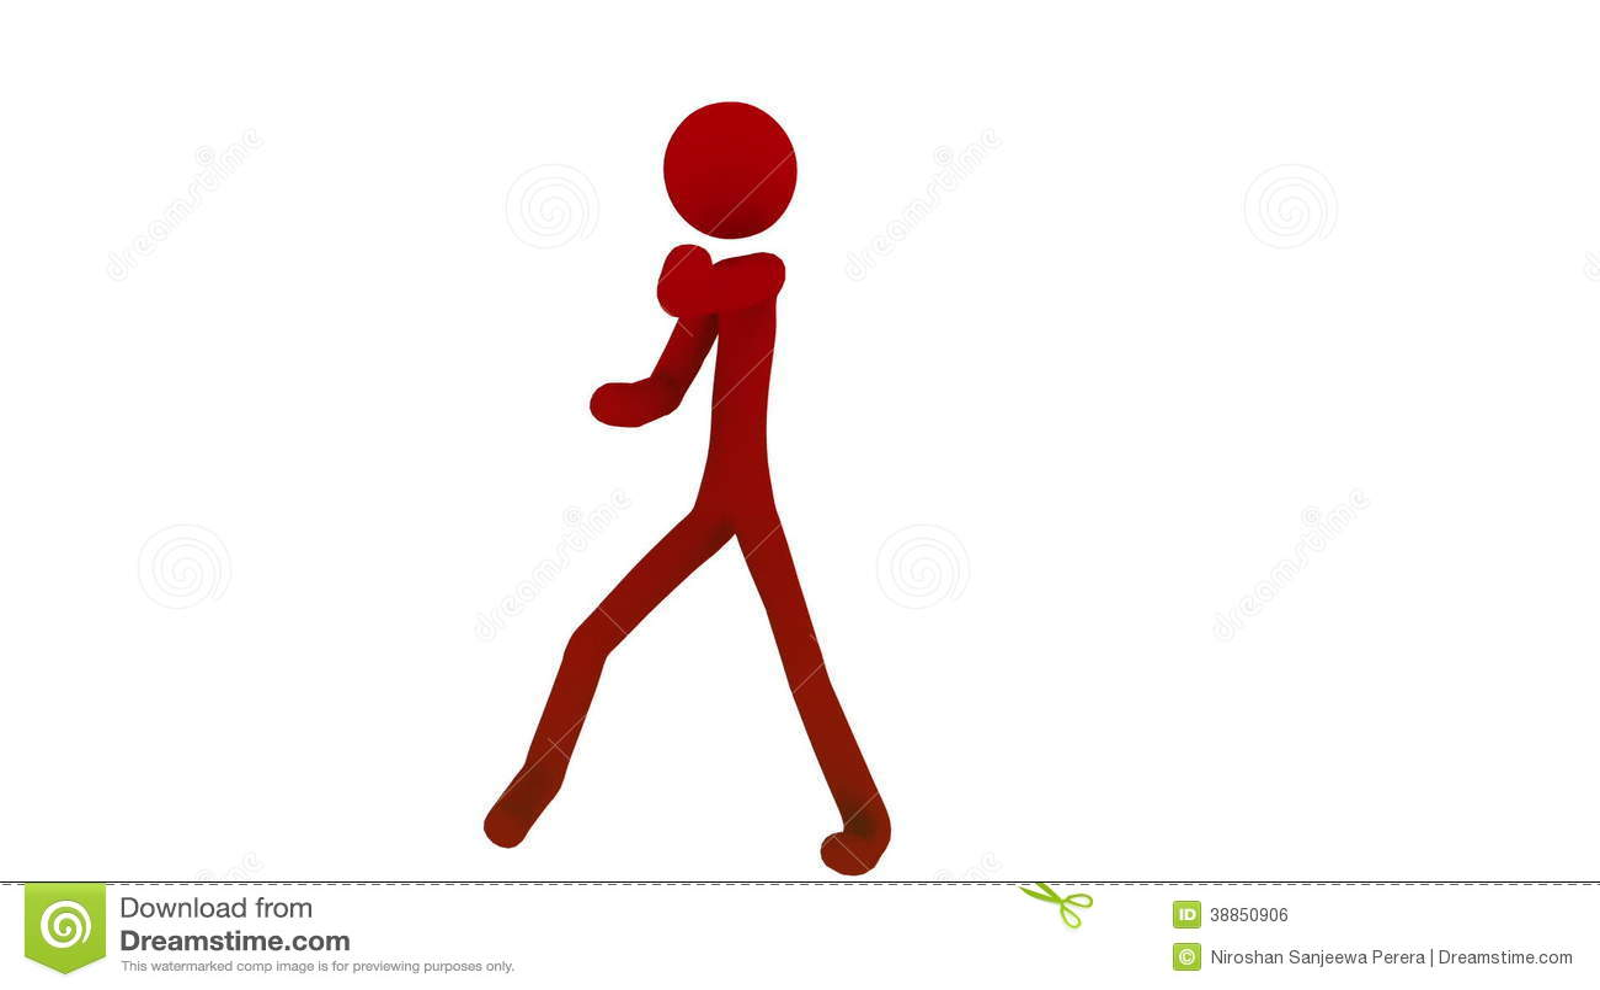 Stick figure man fighting martial arts stock footage video of shape kickboxing 38850906